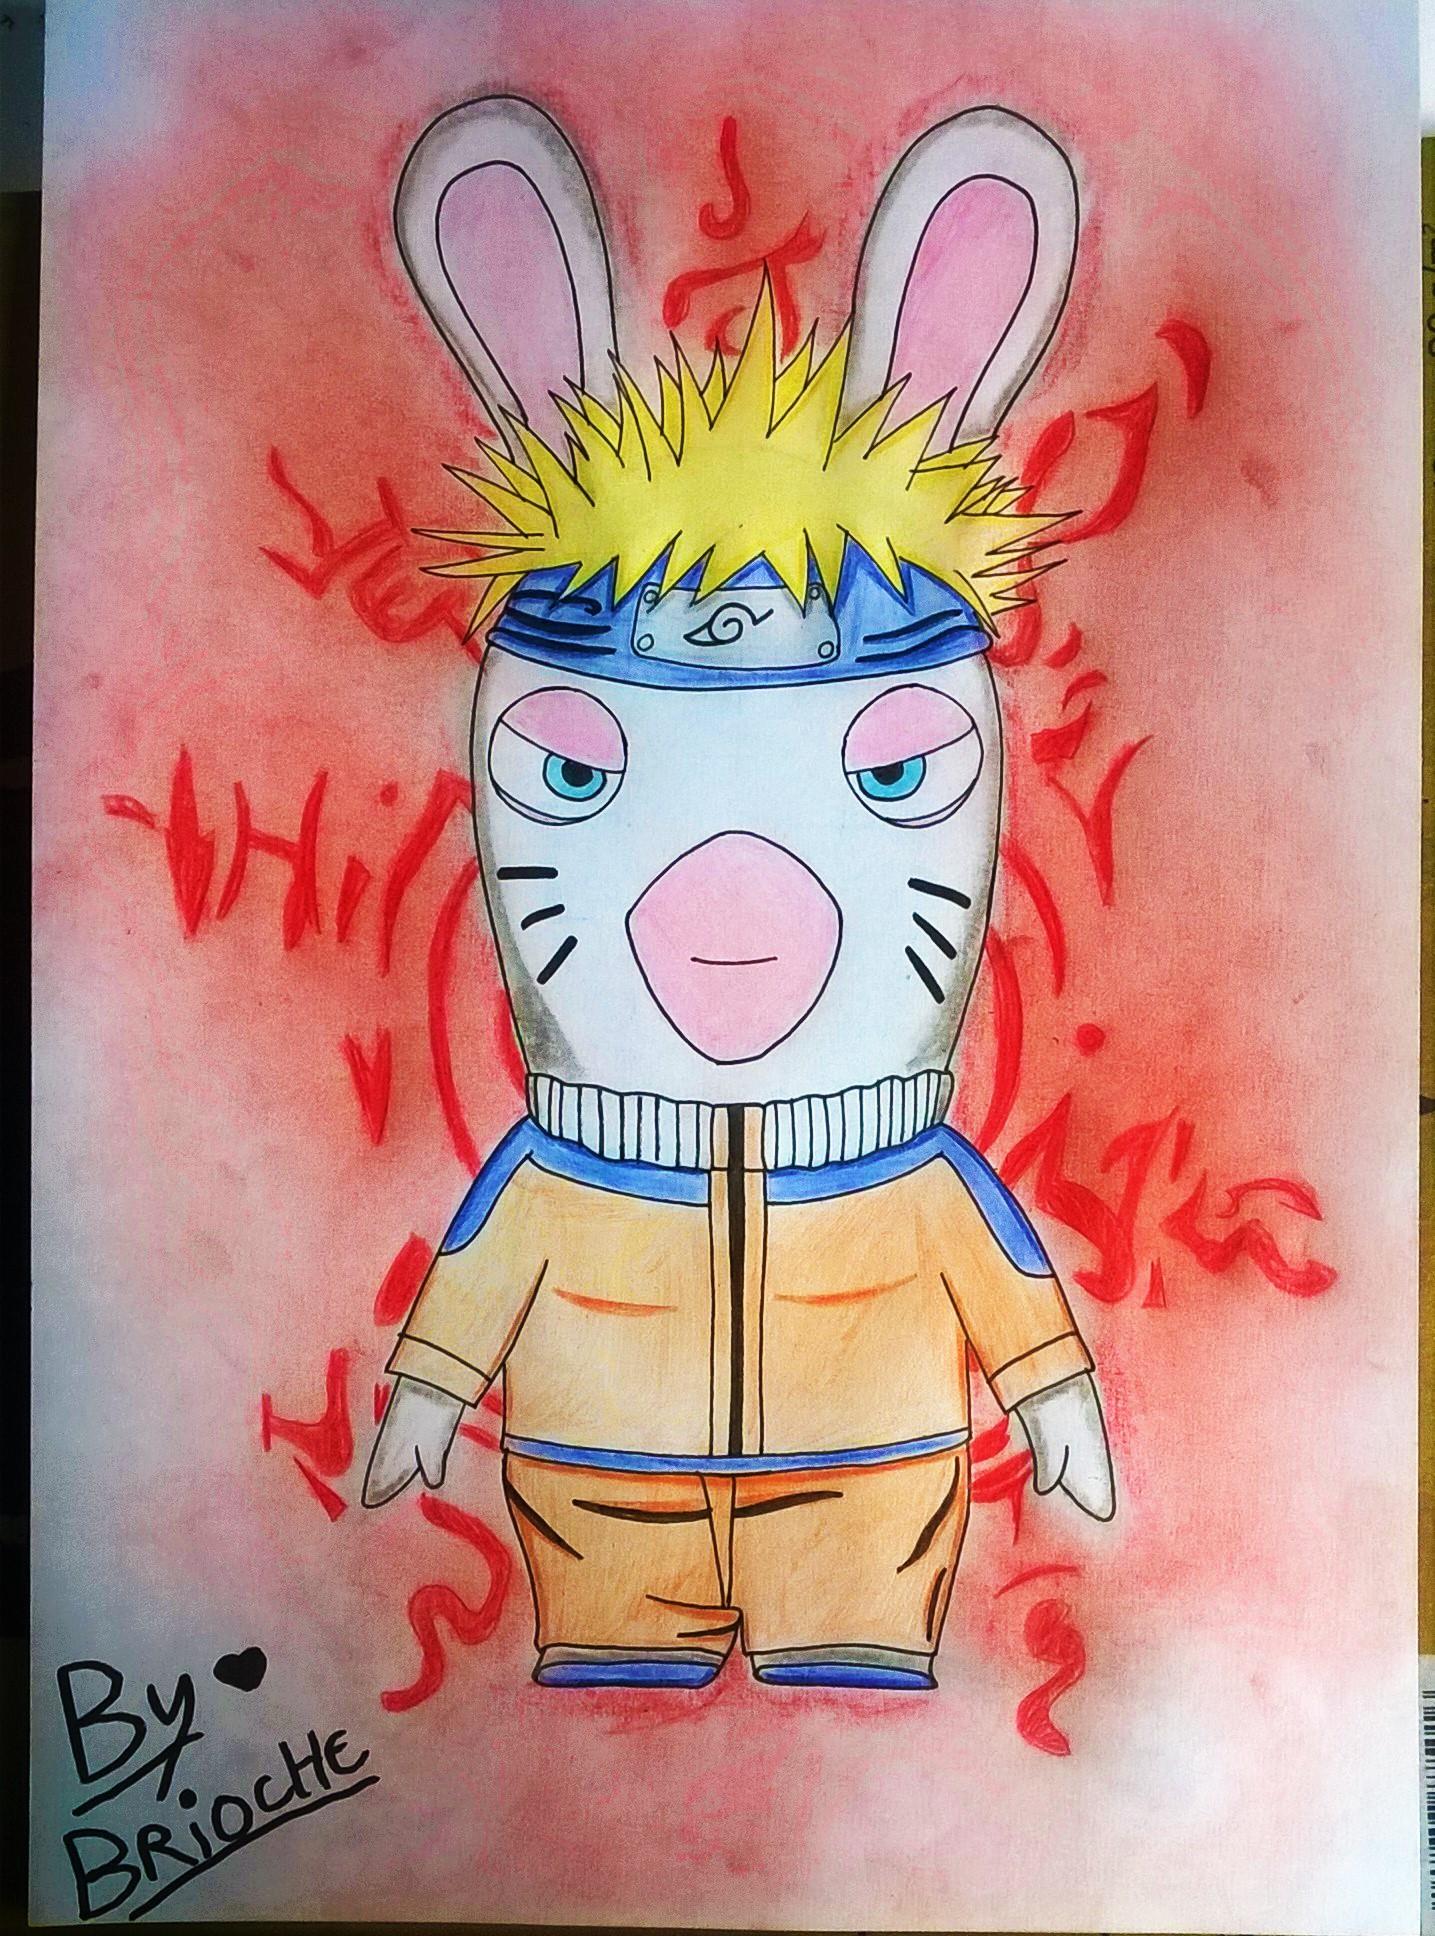 Dessin Lapin Crétin Naruto de BridaKagamiku